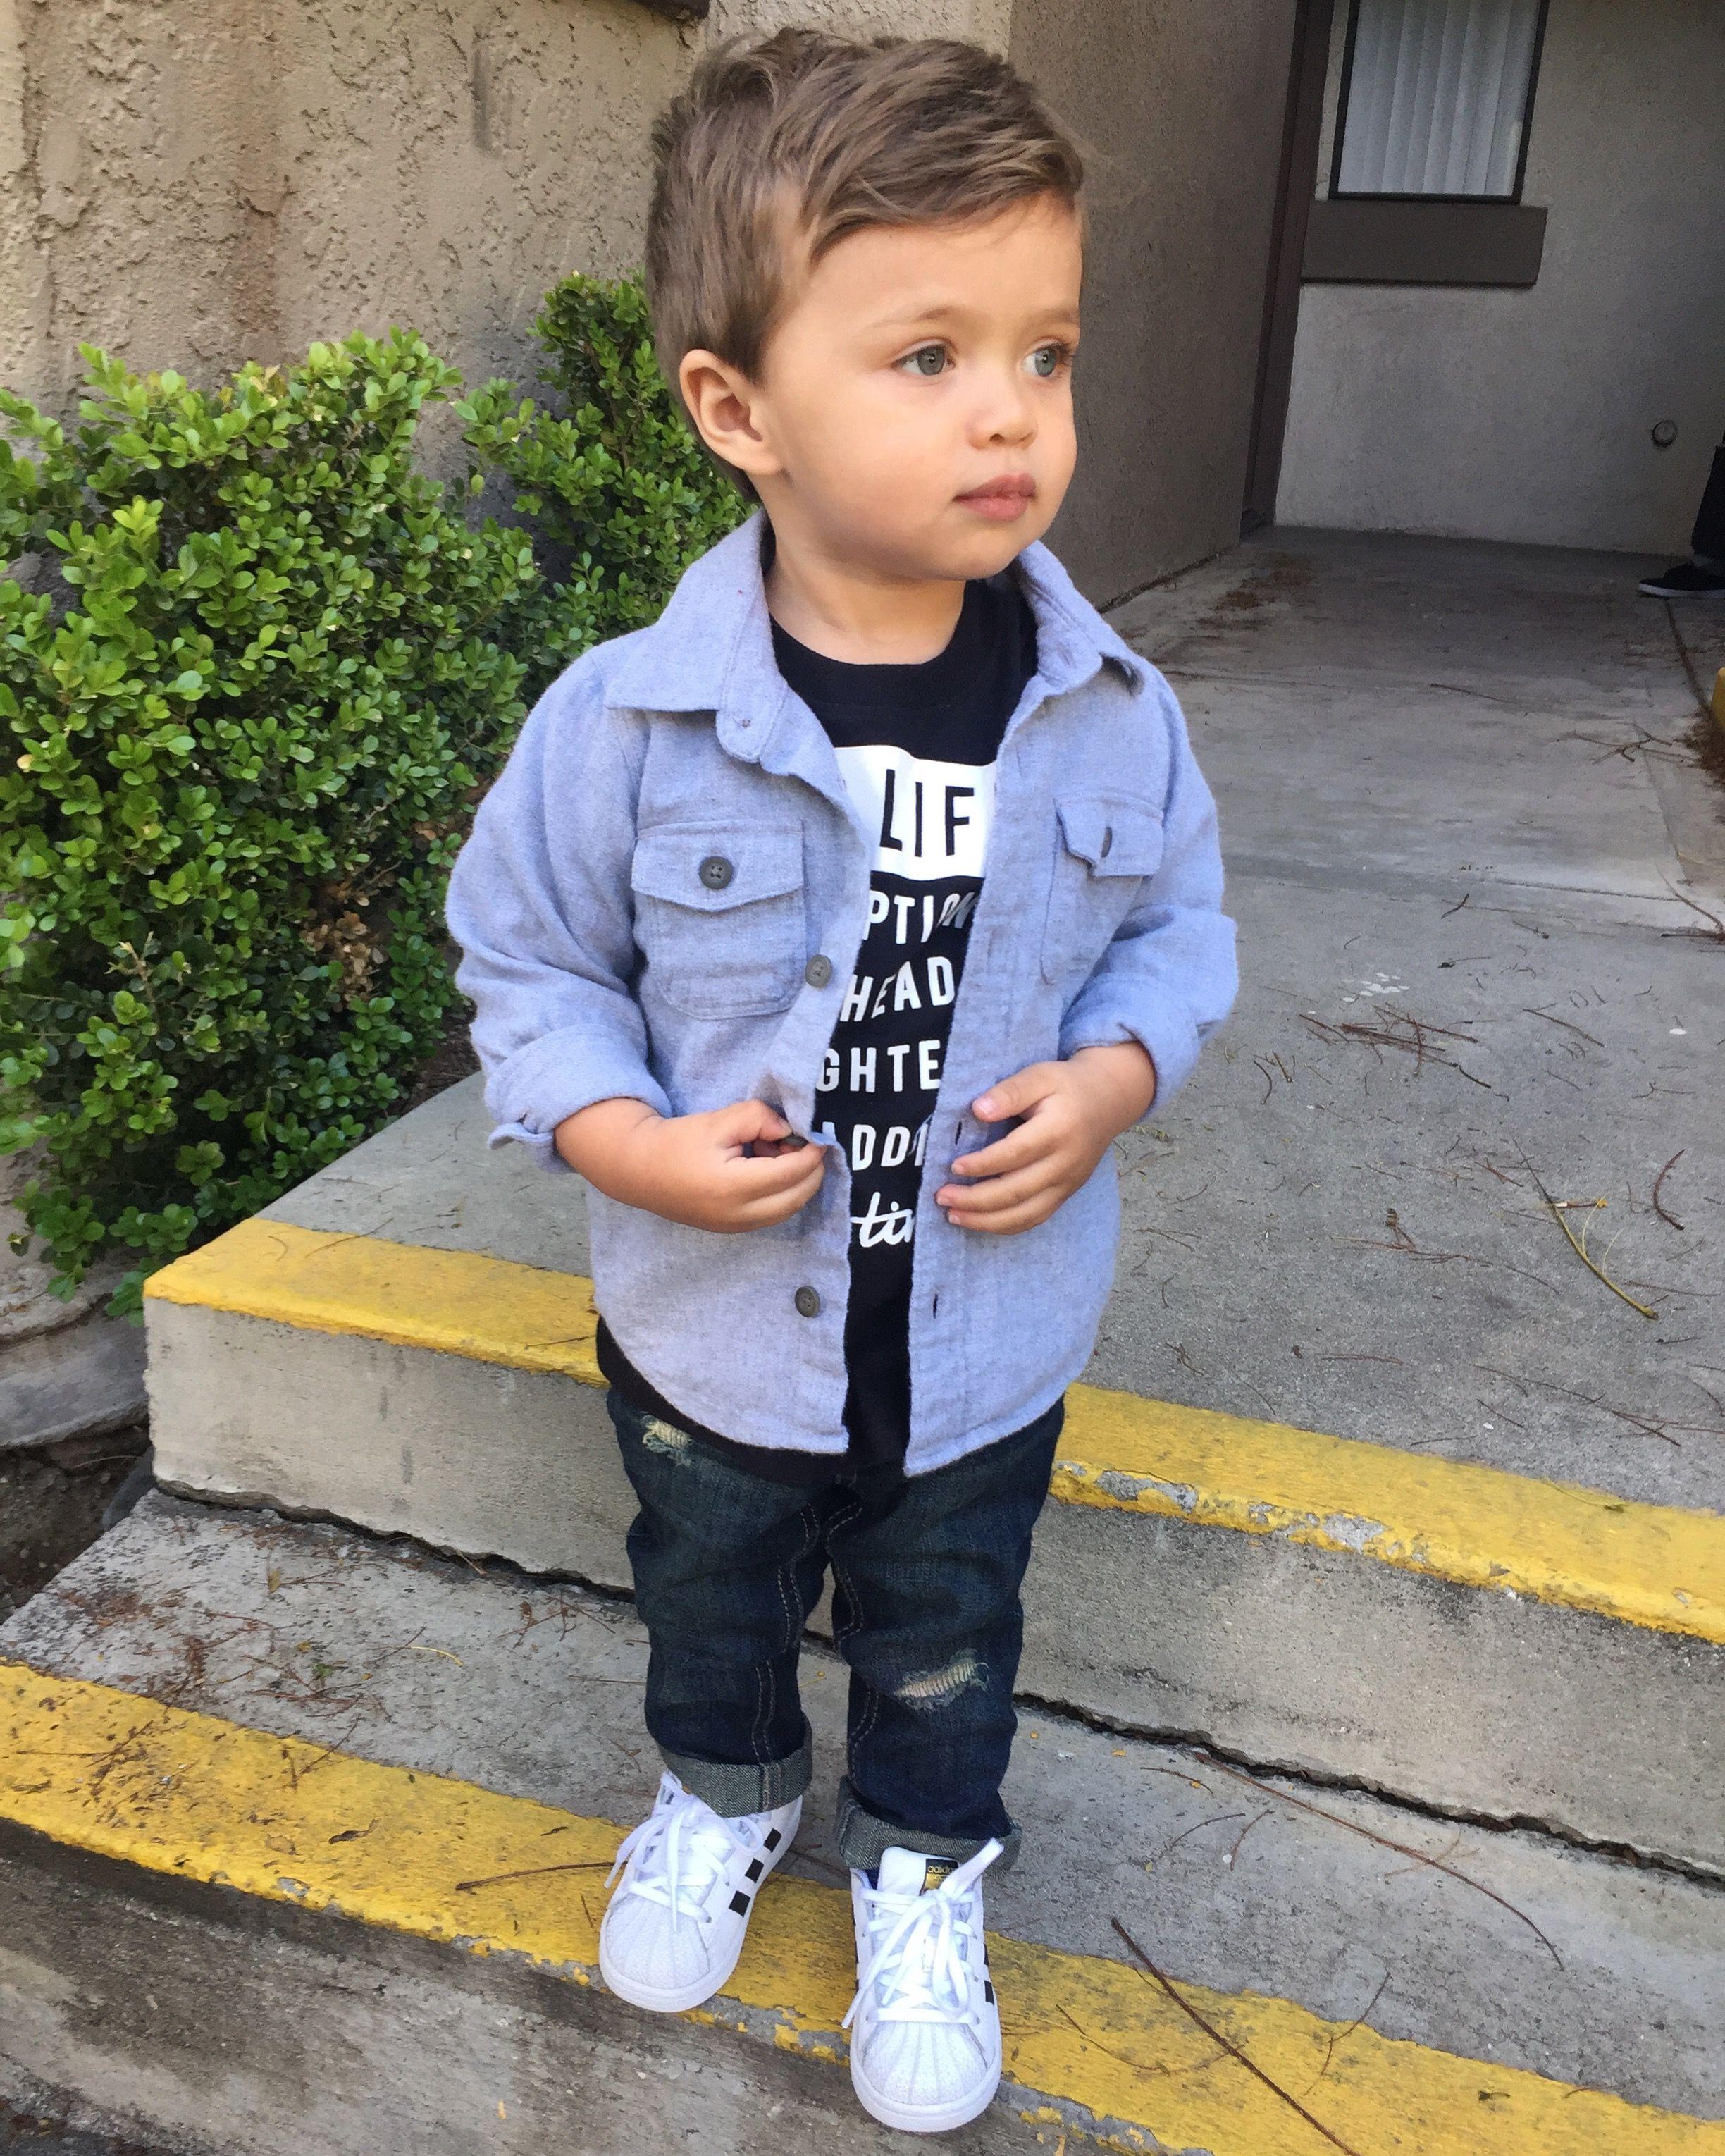 Kid Haircuts With Outfit: Atuendos Para Niños, Moda